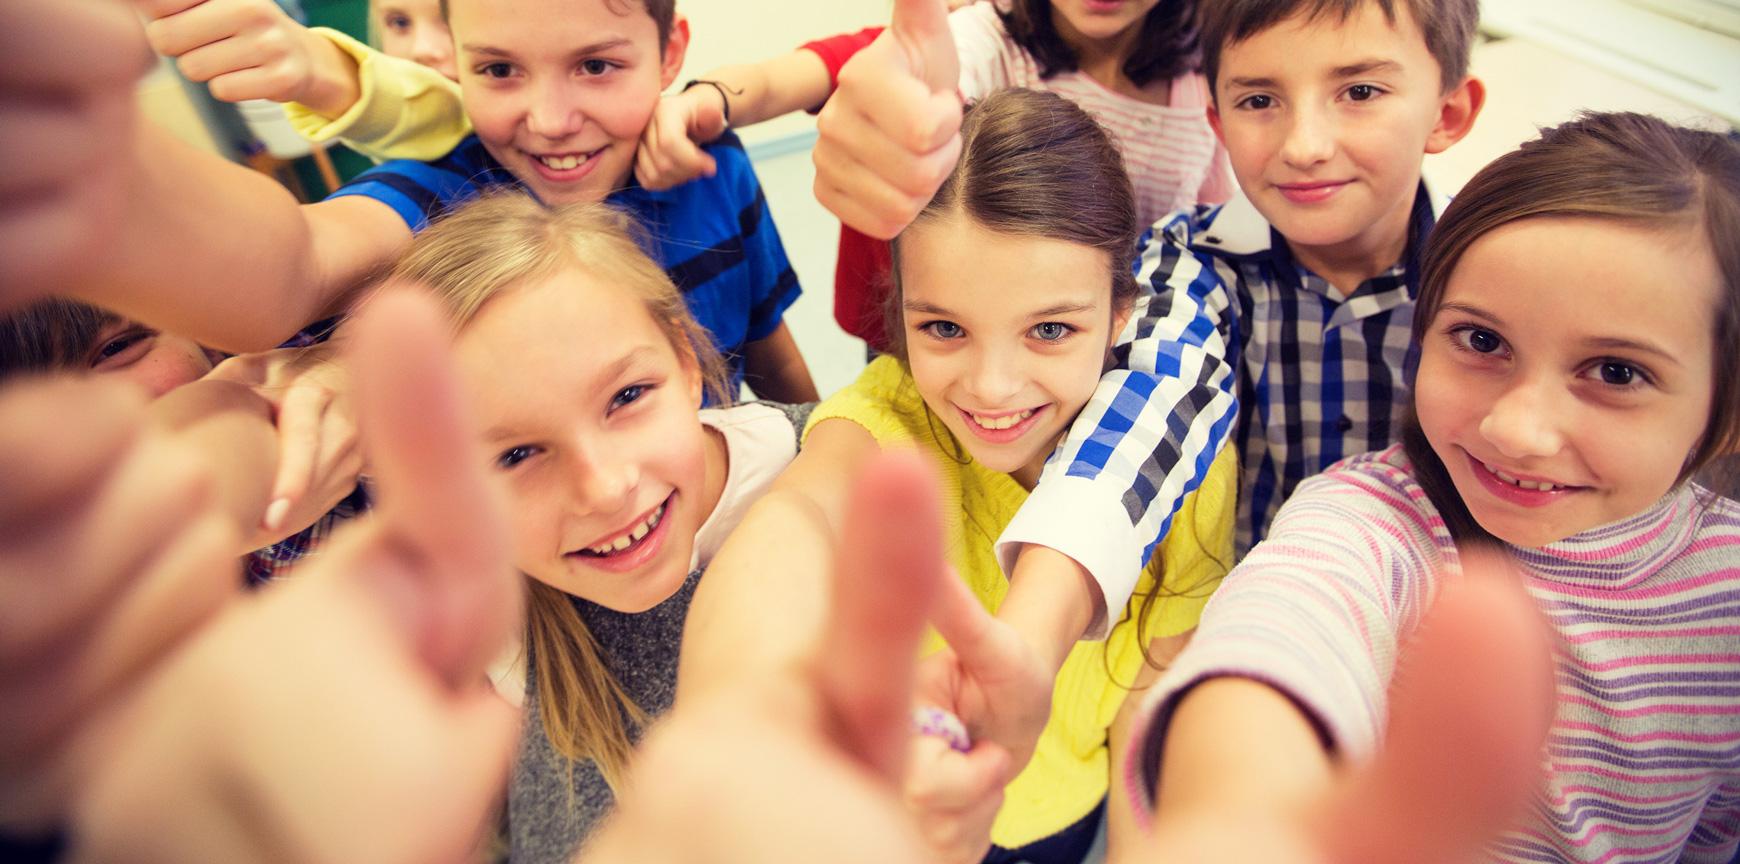 children-thumbs-up